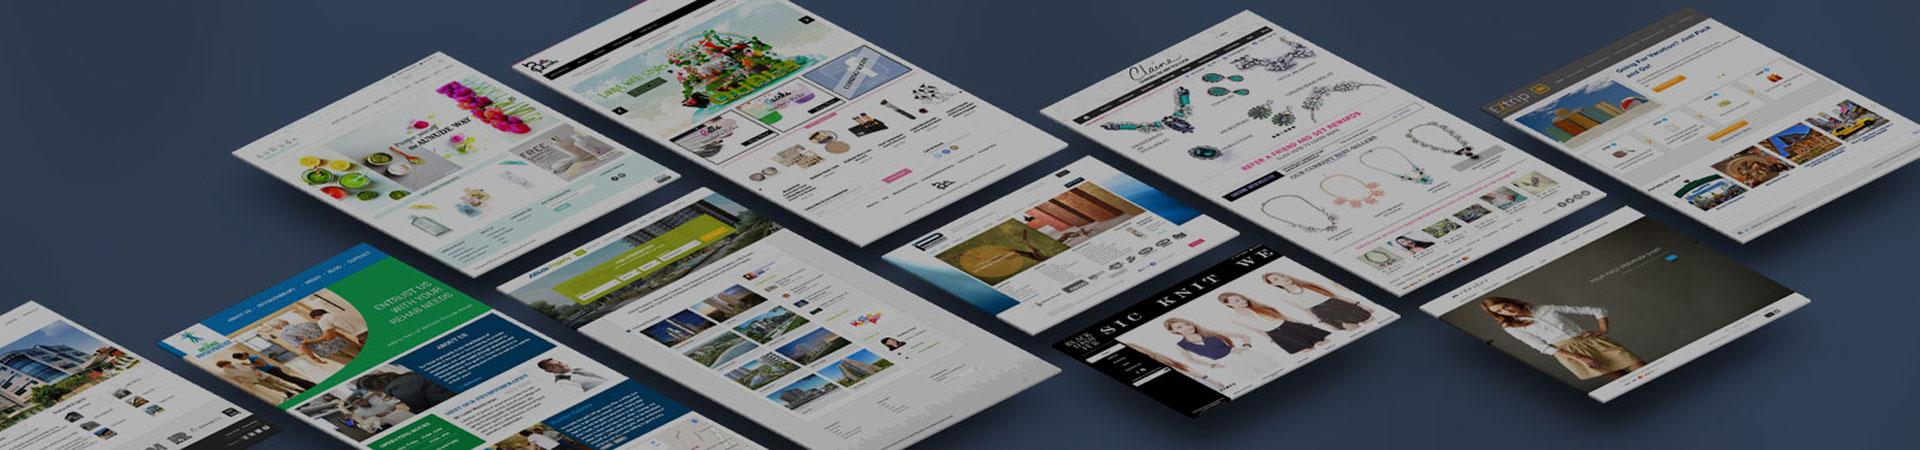 Website Design Singapore - M-tailor